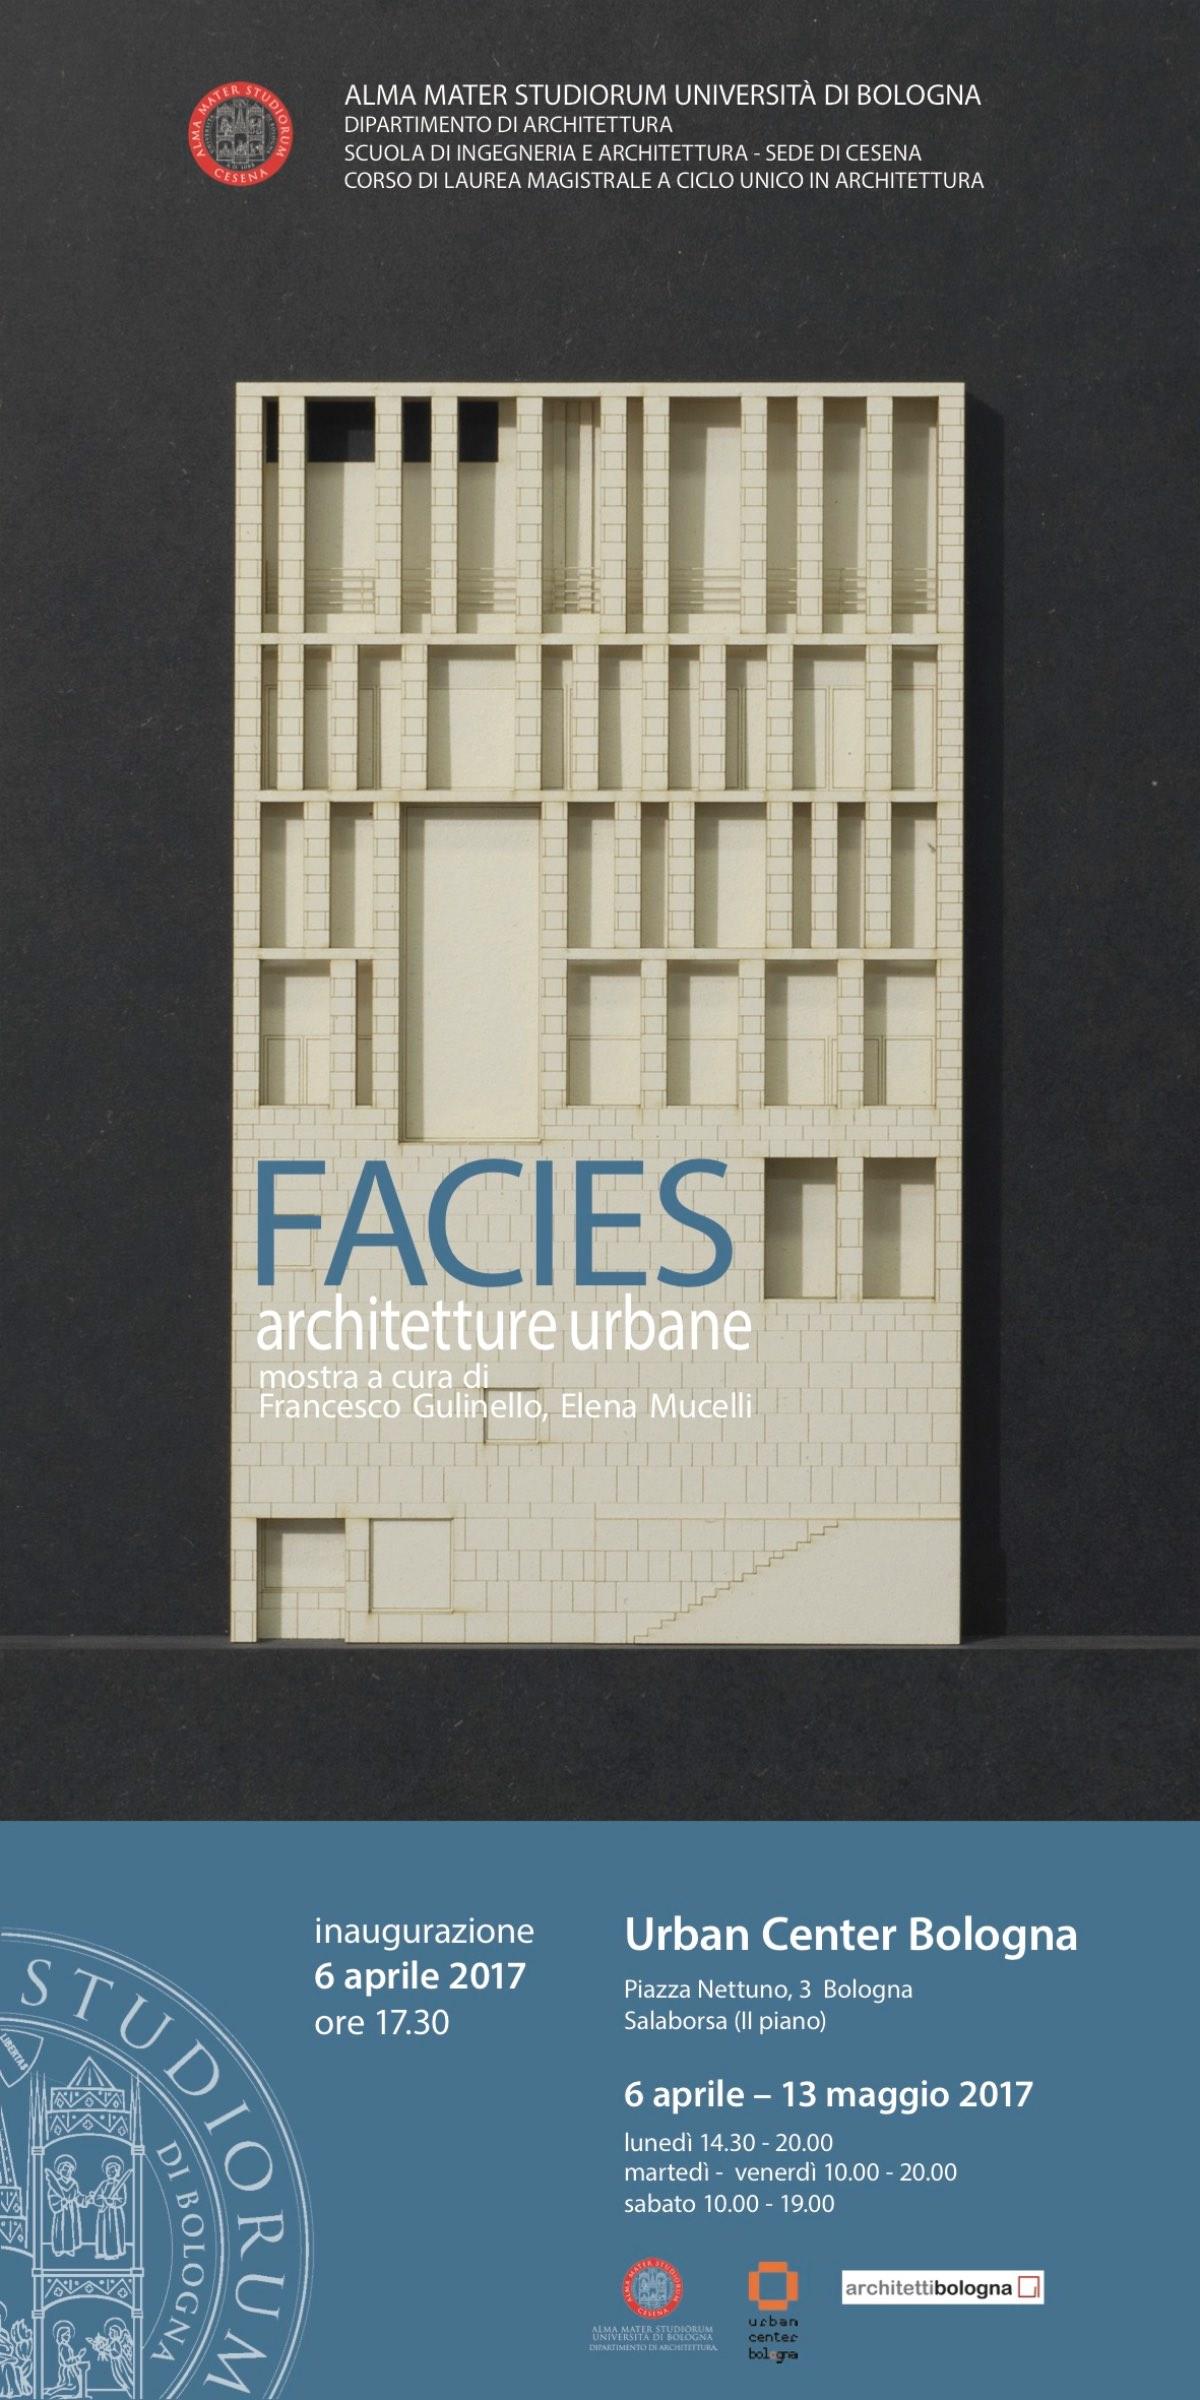 Facies | Architetture urbane